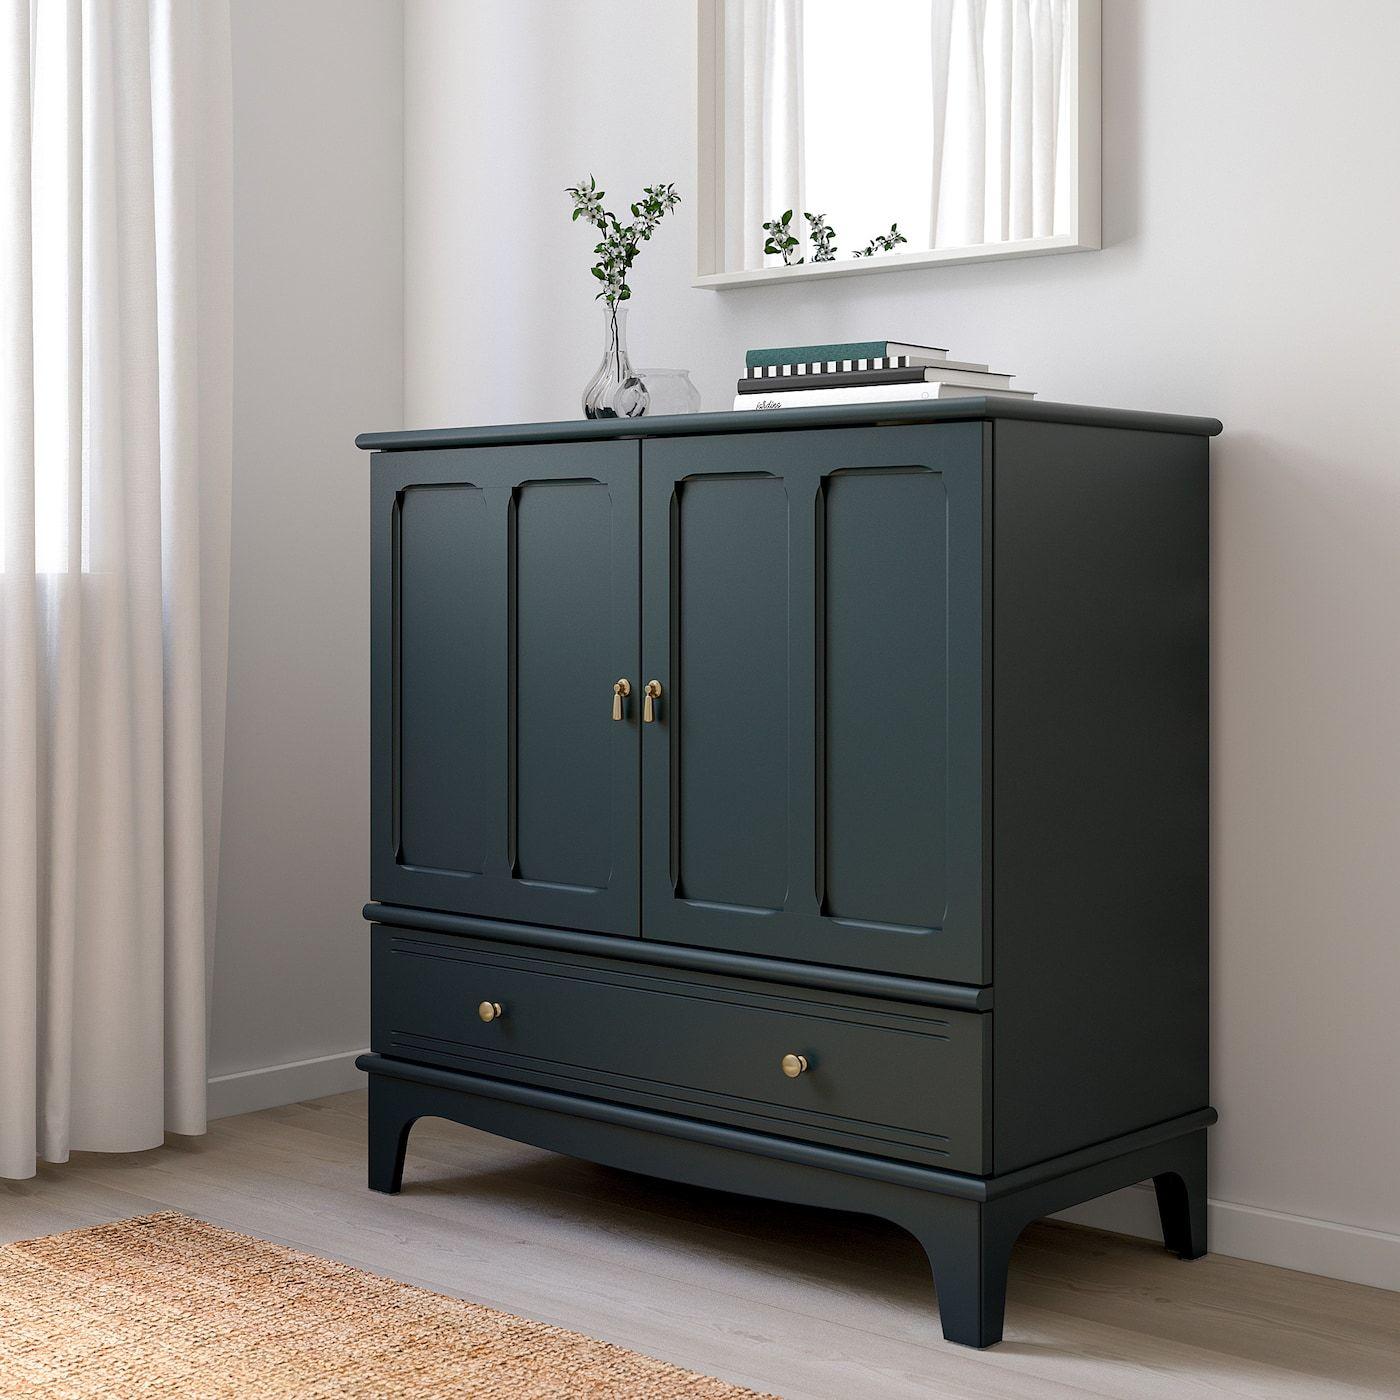 Lommarp Cabinet Dark Blue Green Ikea In 2020 Ikea Green Furniture Dark Blue Green